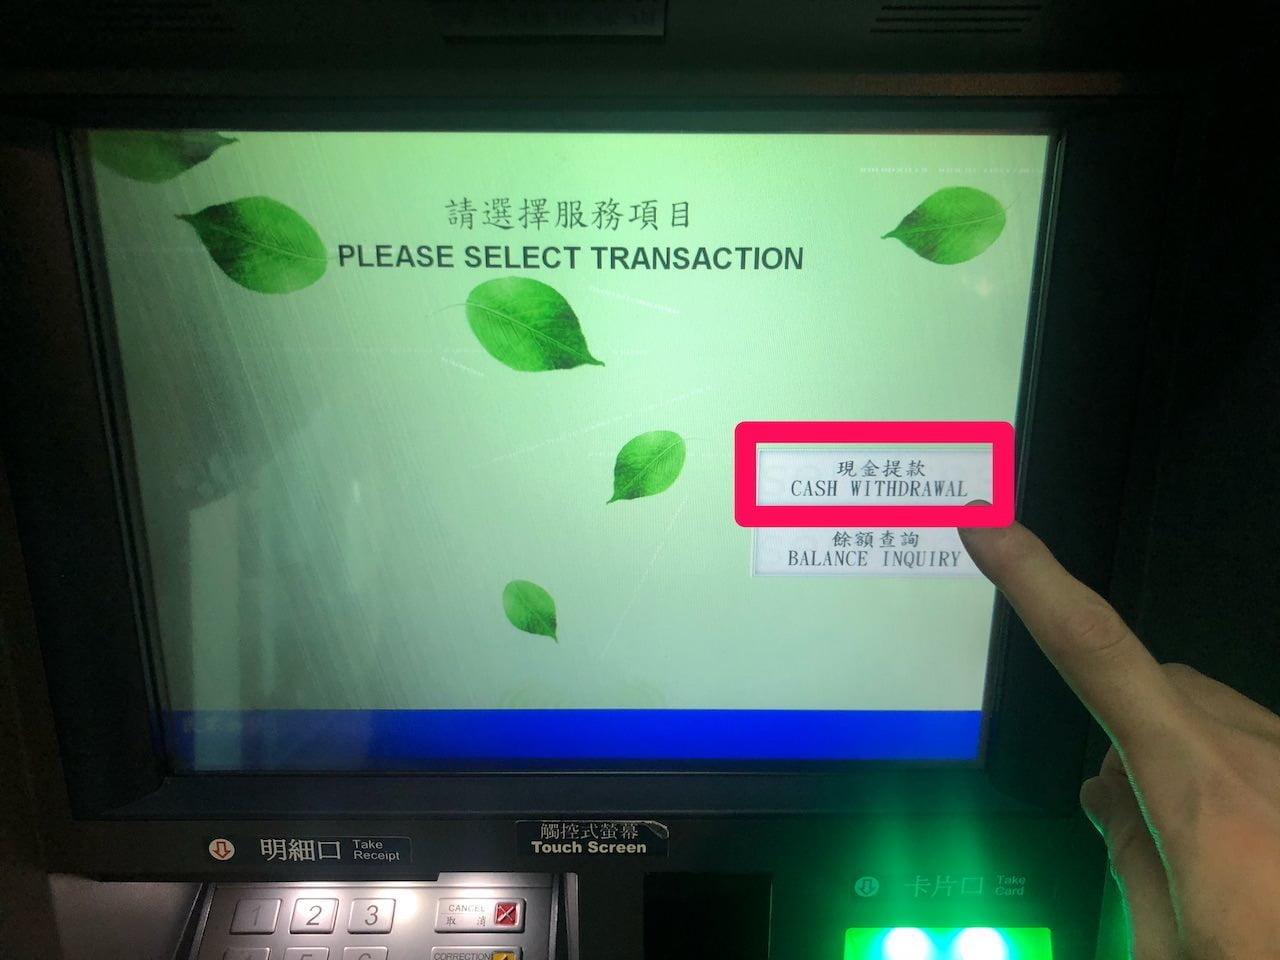 桃園空港の兆豊国際商業銀行のATM